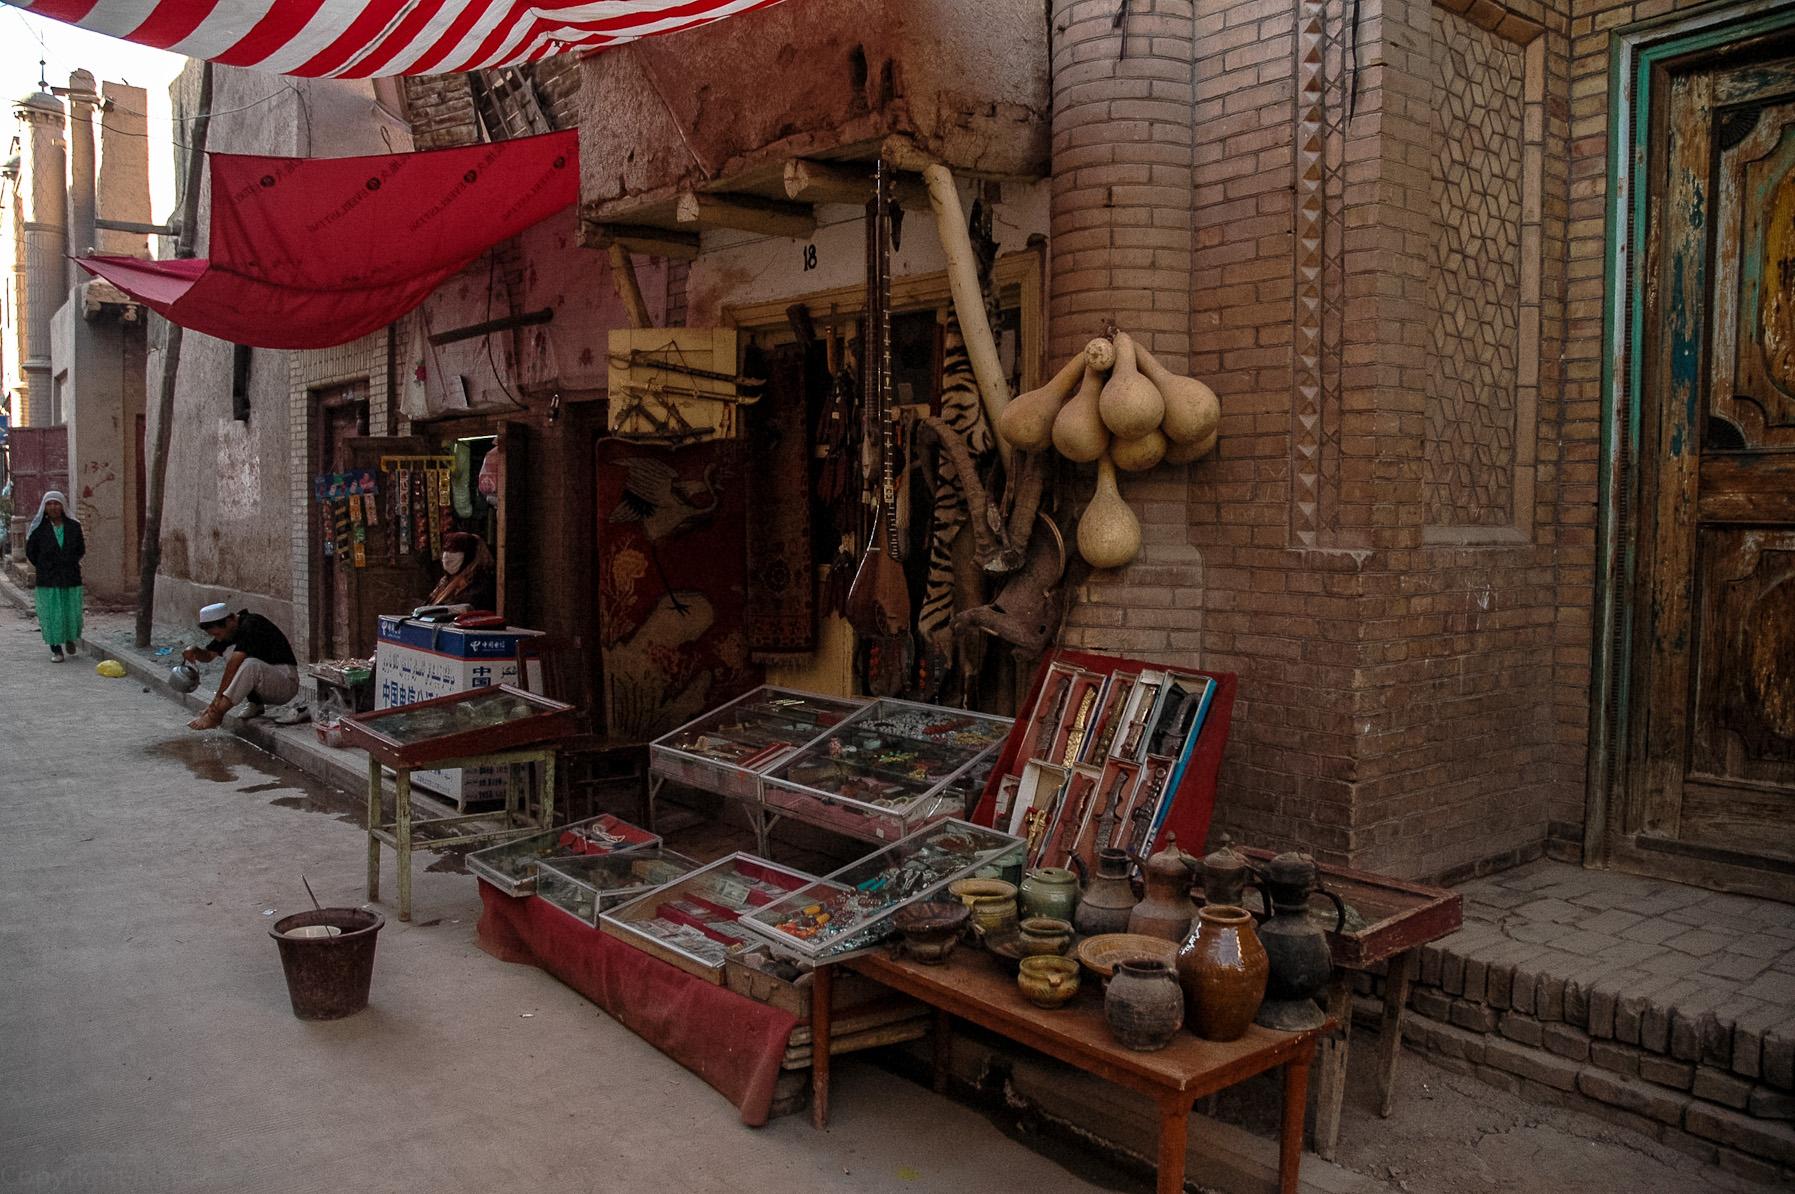 Stary Kaszgar